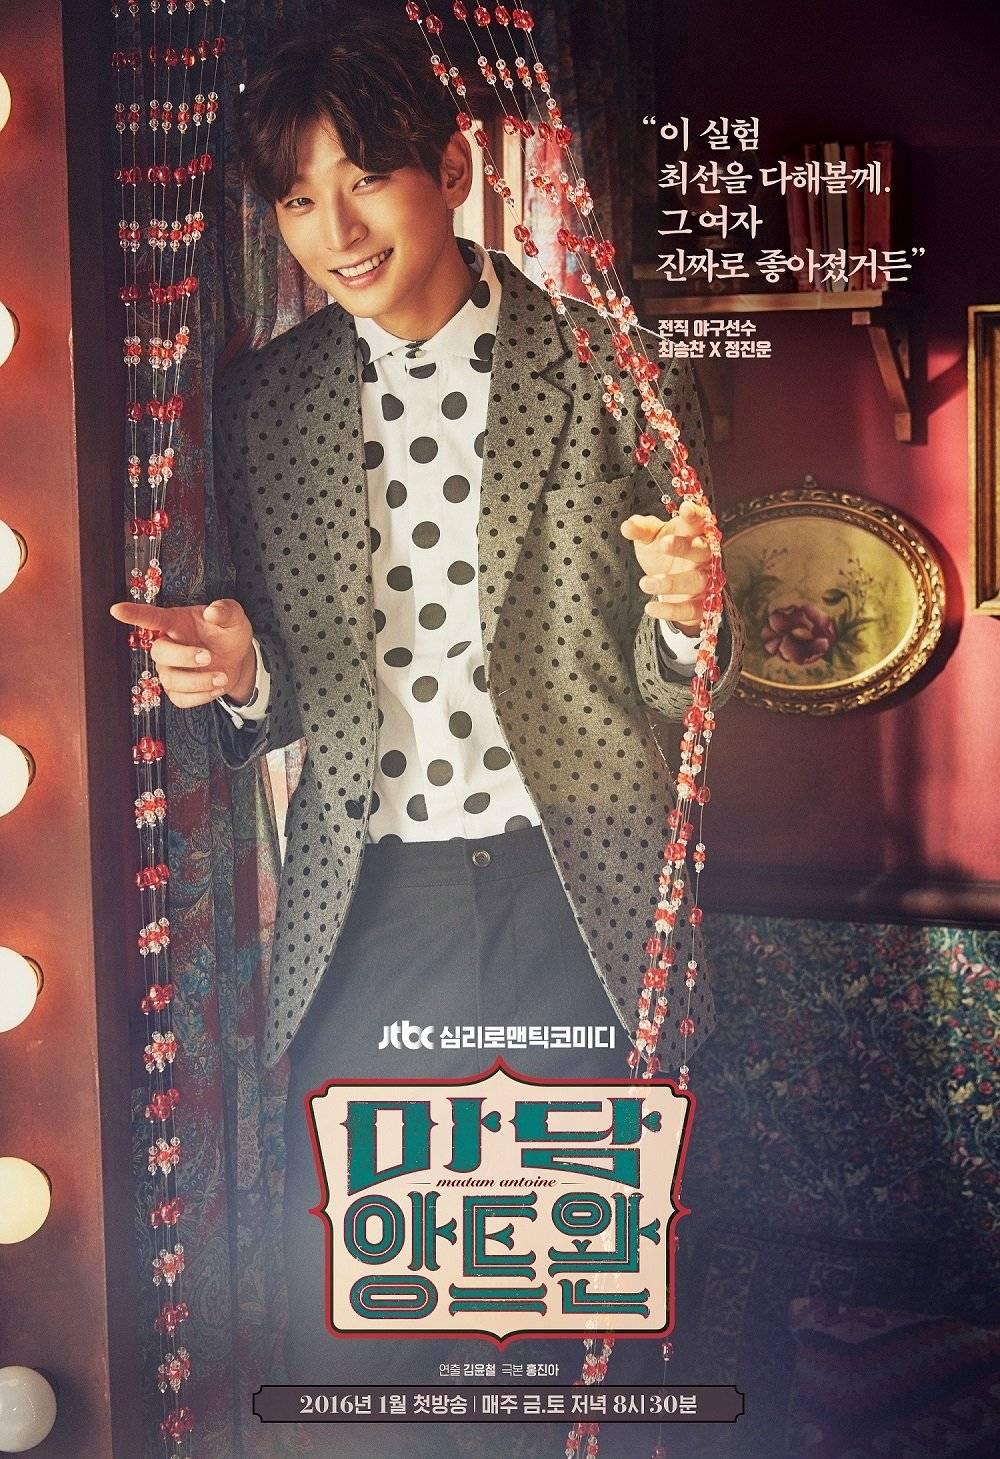 Download Drama Korea Madame Antoine Subtitle Indonesia : download, drama, korea, madame, antoine, subtitle, indonesia, Madame, Antoine, (Korean, Drama, 2015), 마담, 앙트완, HanCinema, Korean, Movie, Database